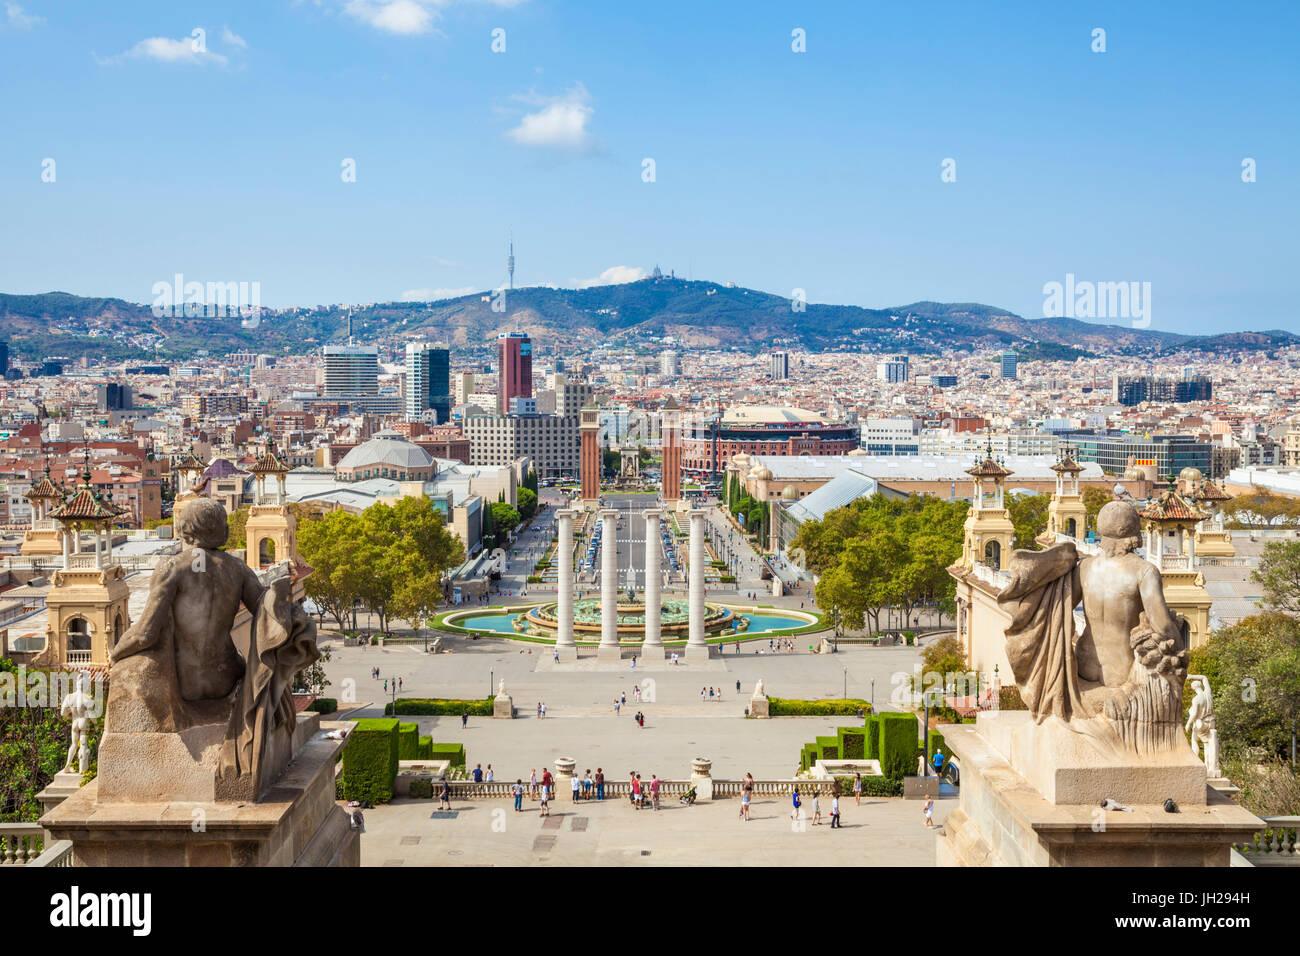 Skyline-Blick über Barcelona Montjuic, Barcelona, Katalonien (Catalunya), Spanien, Europa Stockbild